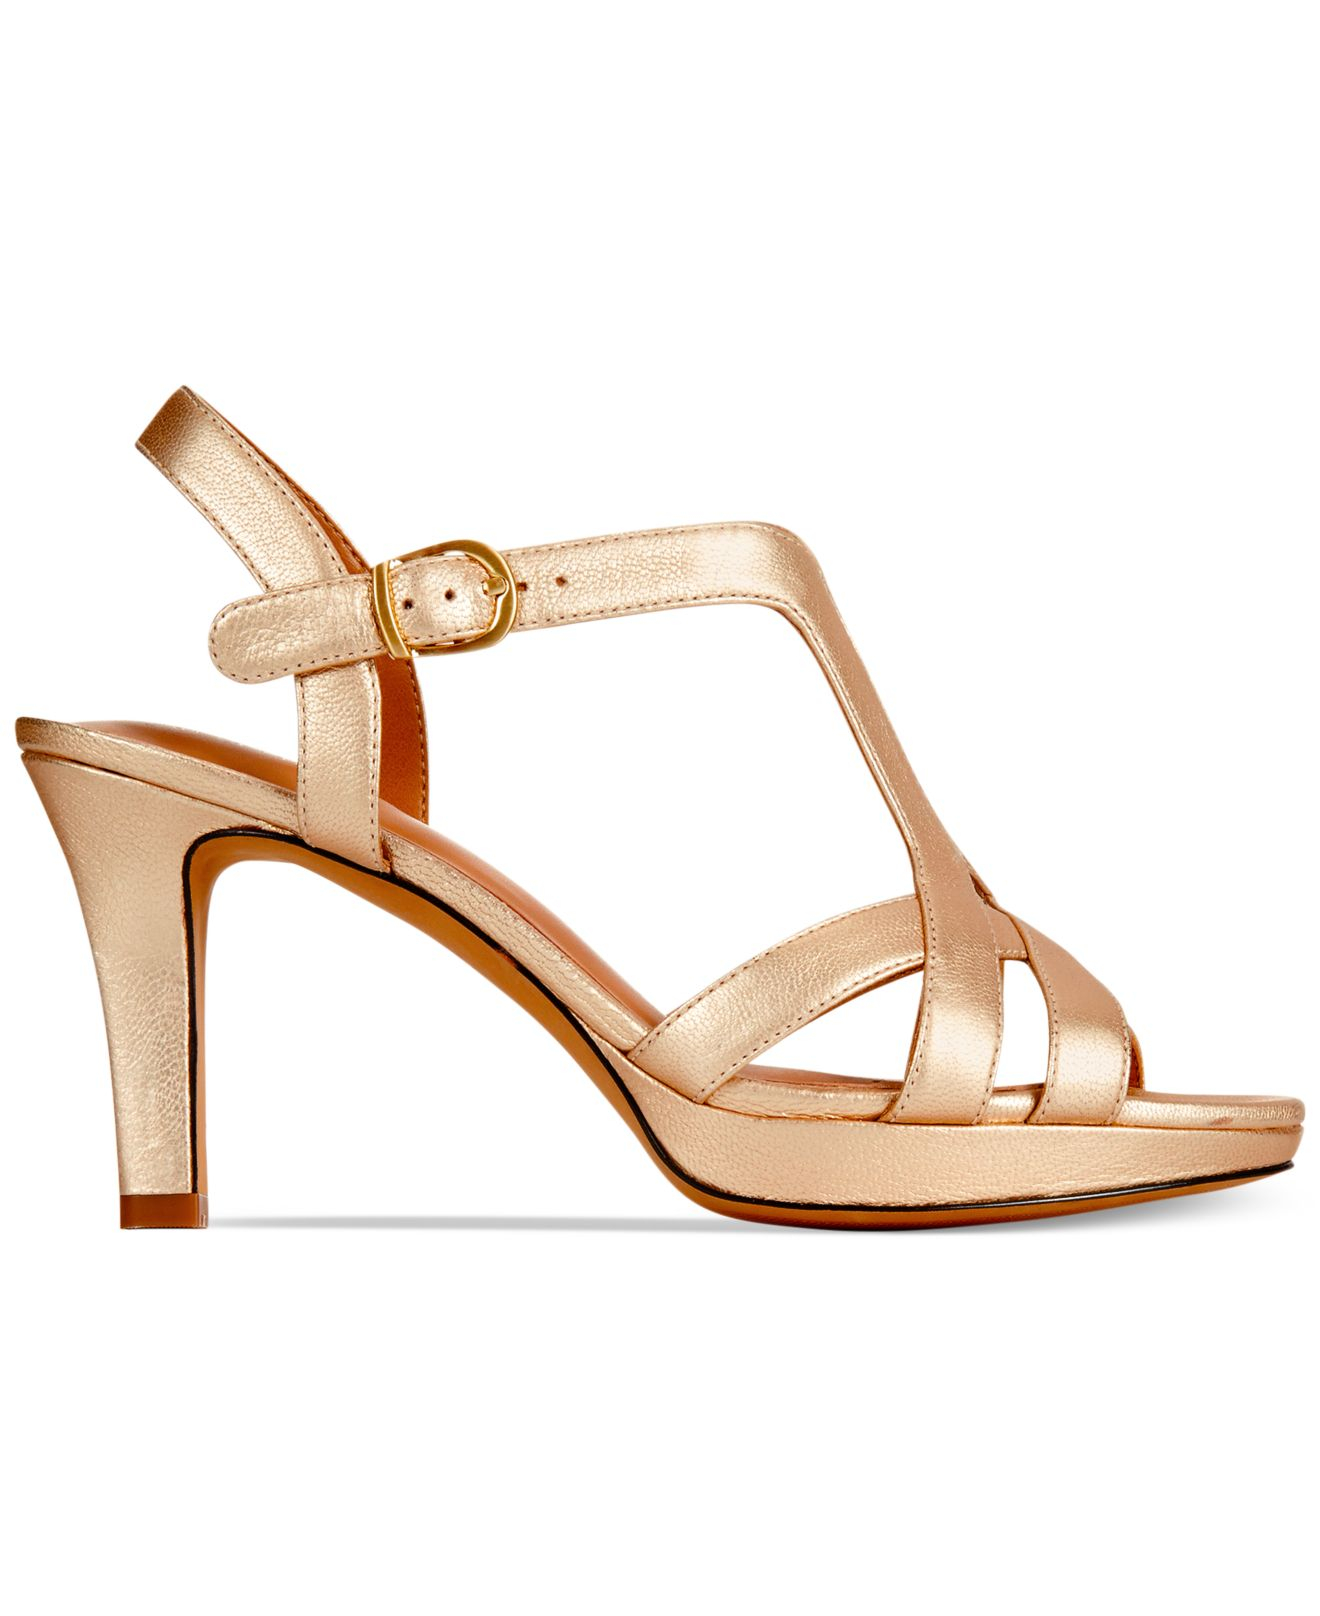 631fb657e91b Lyst - Clarks Artisan Women s Delsie Risa Platform Evening Sandals ...